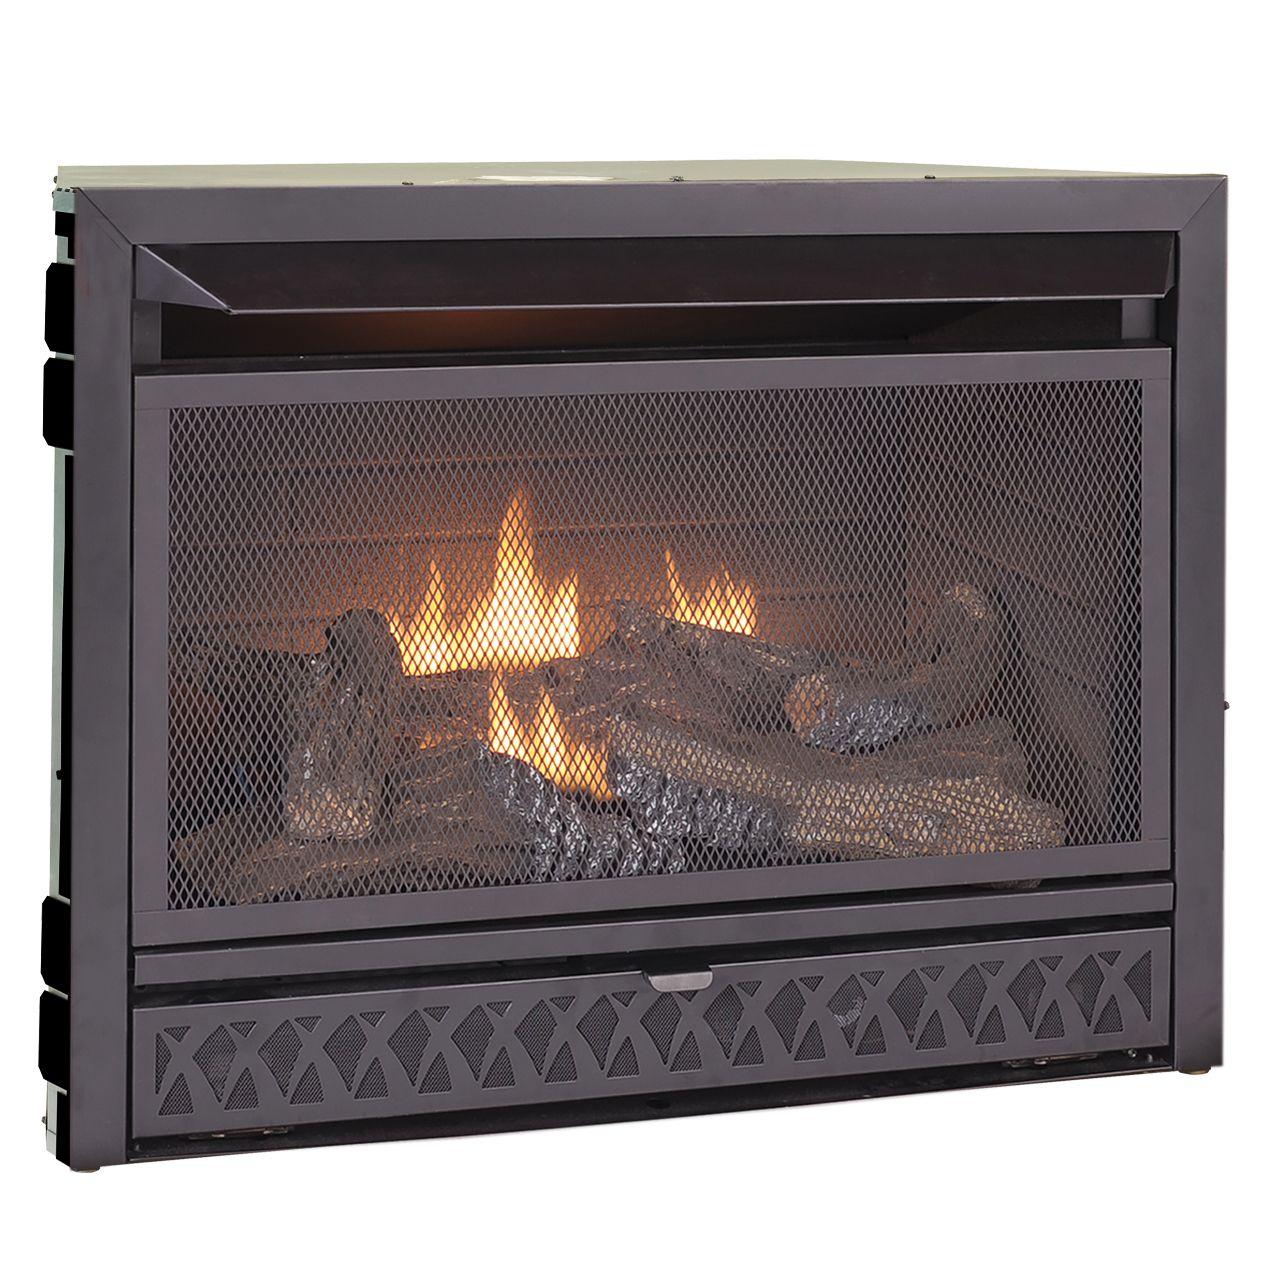 Procom Ventless Fireplace Insert Model Fbnsd28t Vent Free Gas